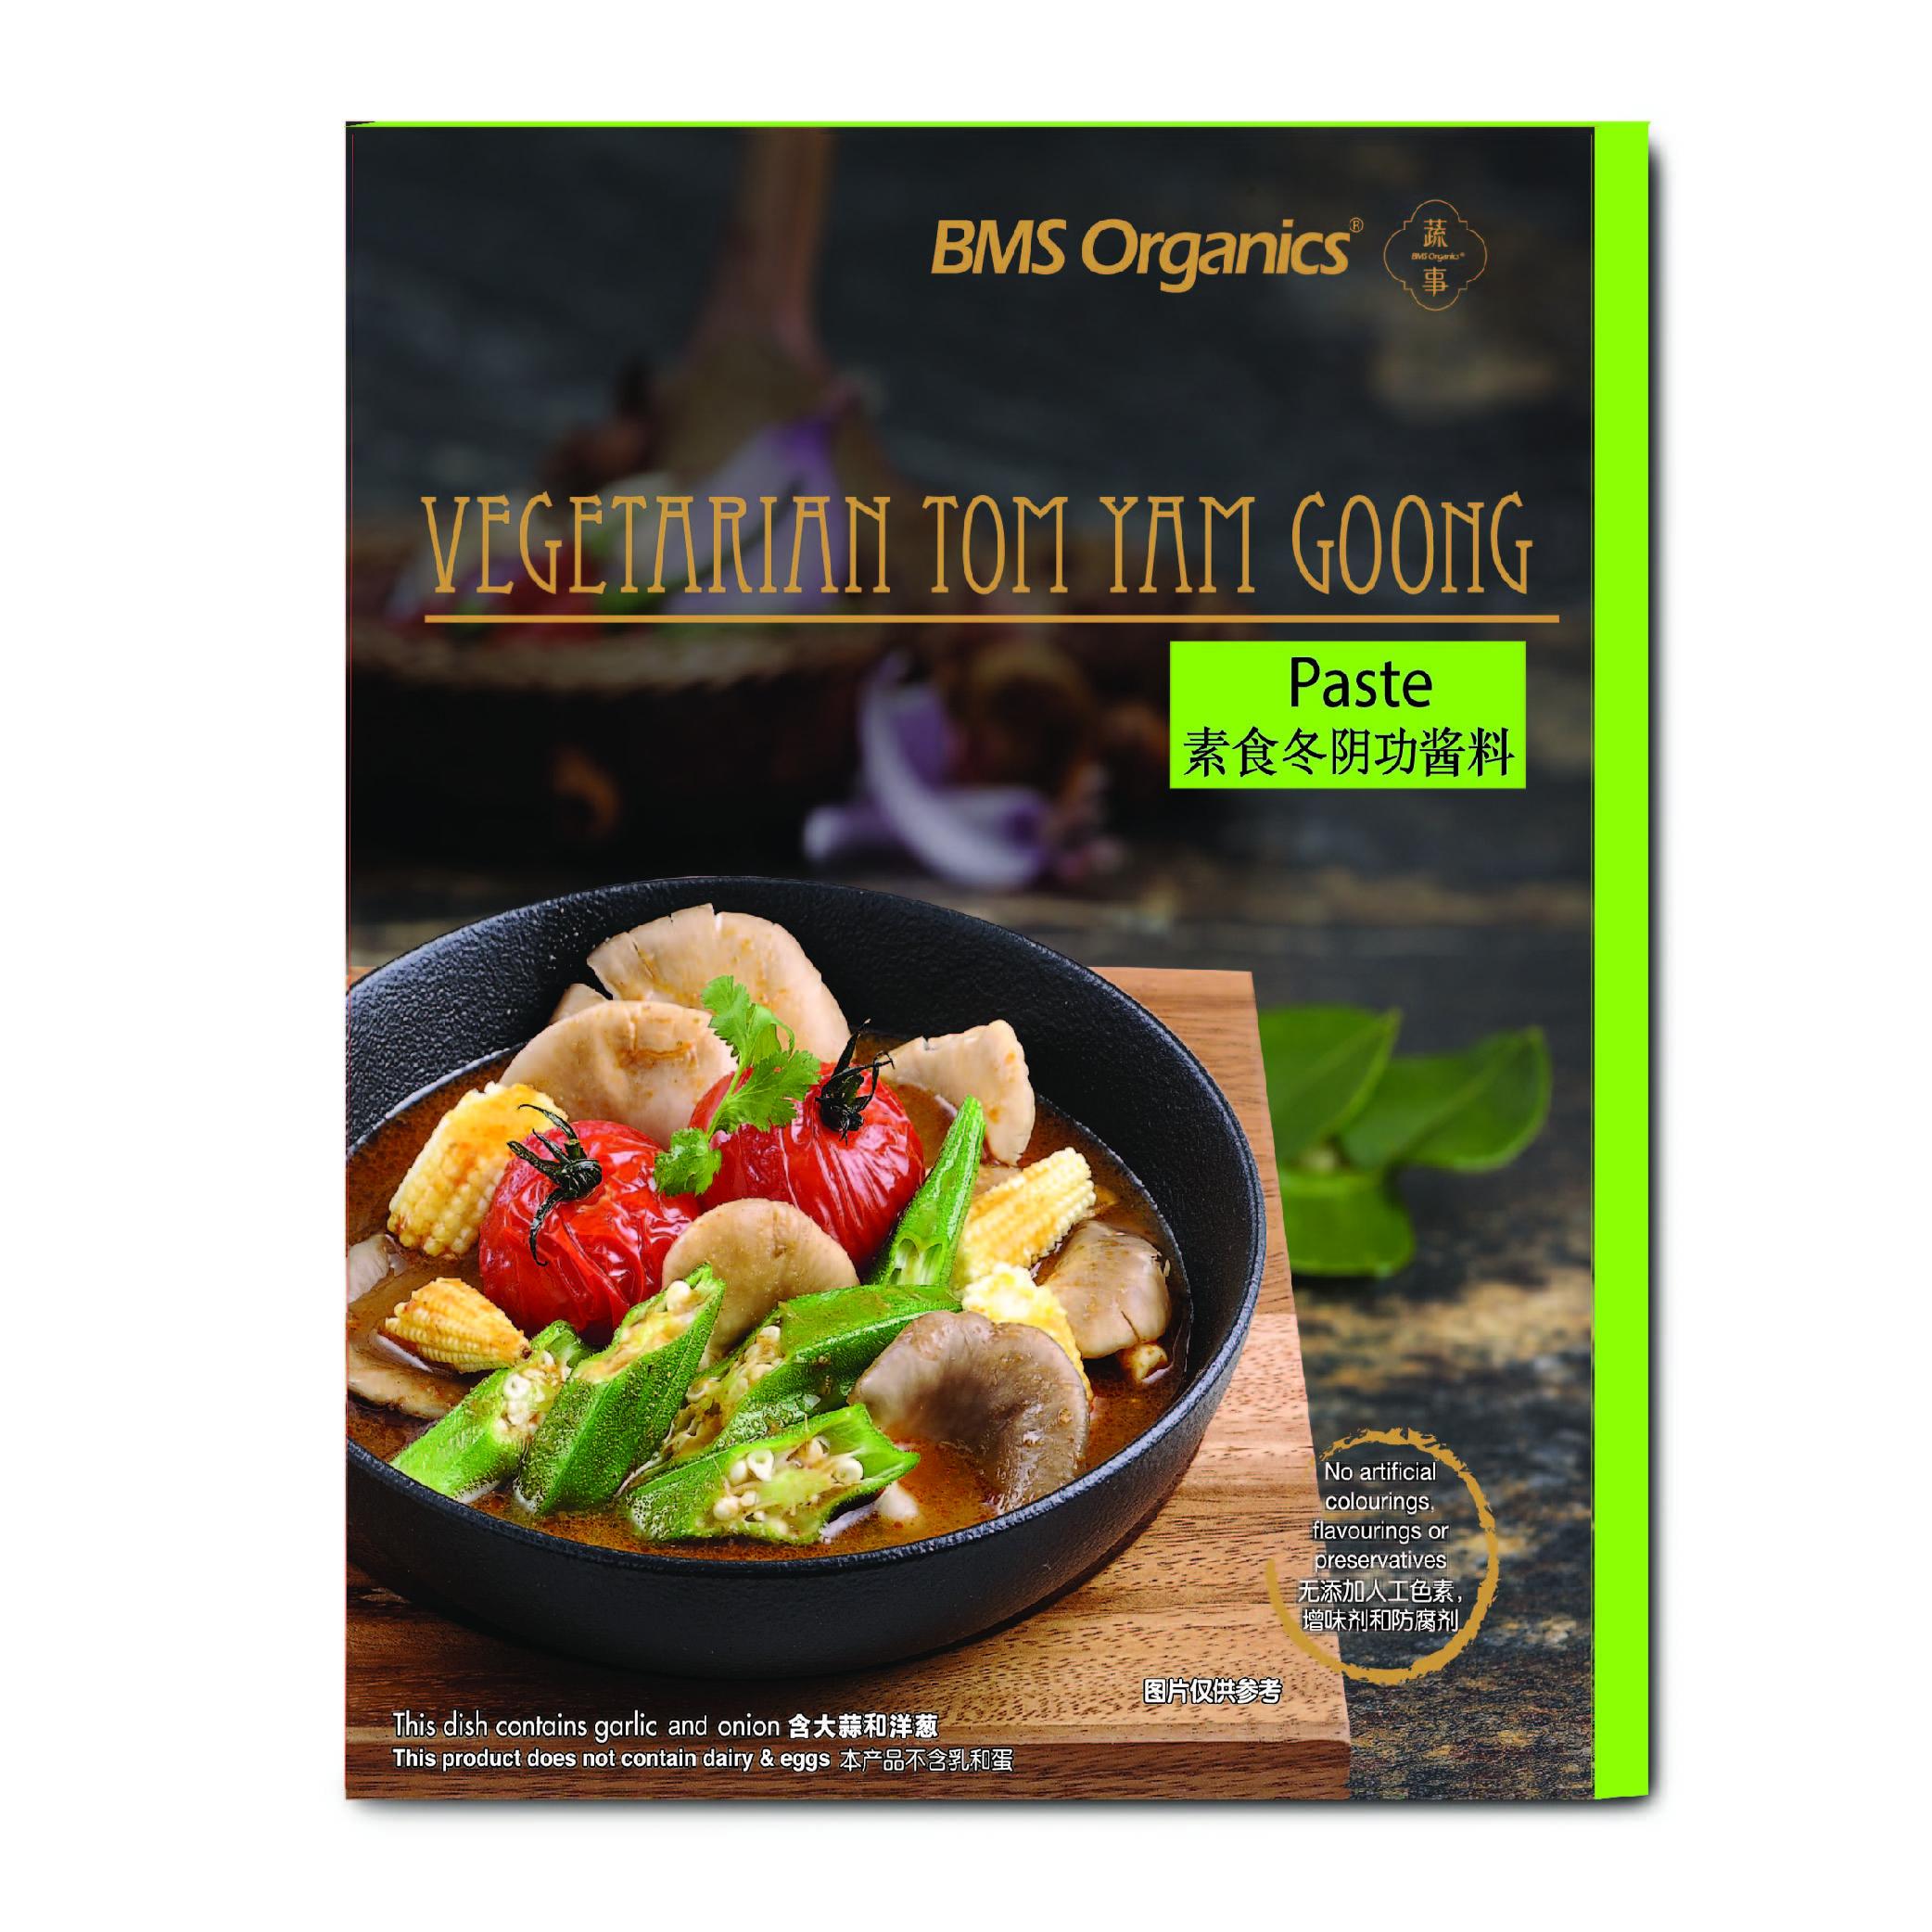 BMS Organics Tom Yam Goong Paste (3 Packs Bundle)